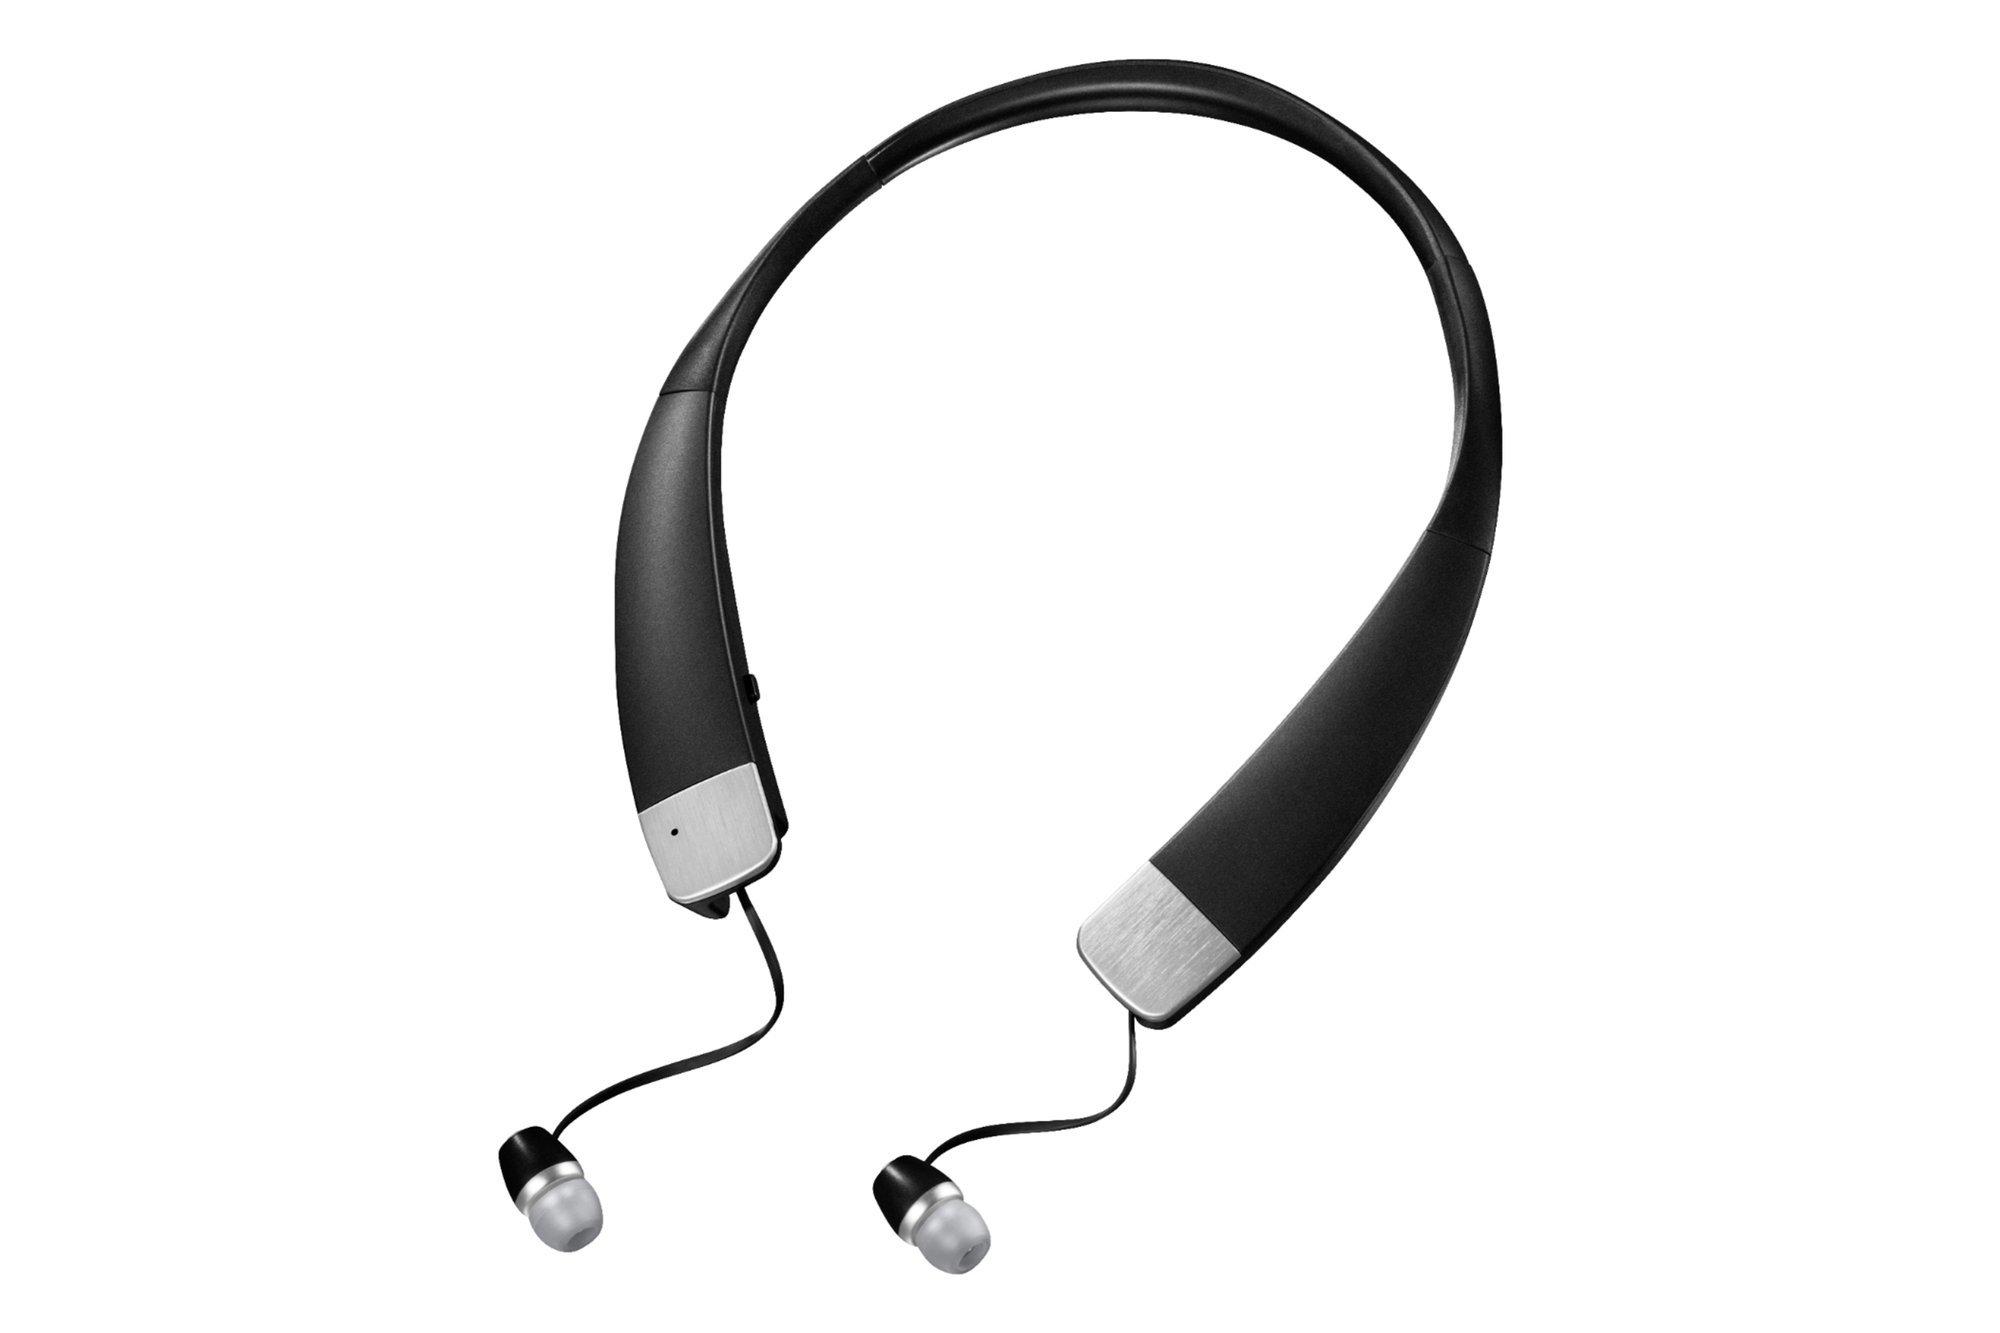 Insignia Wireless Over-the-Ear Headphones Black